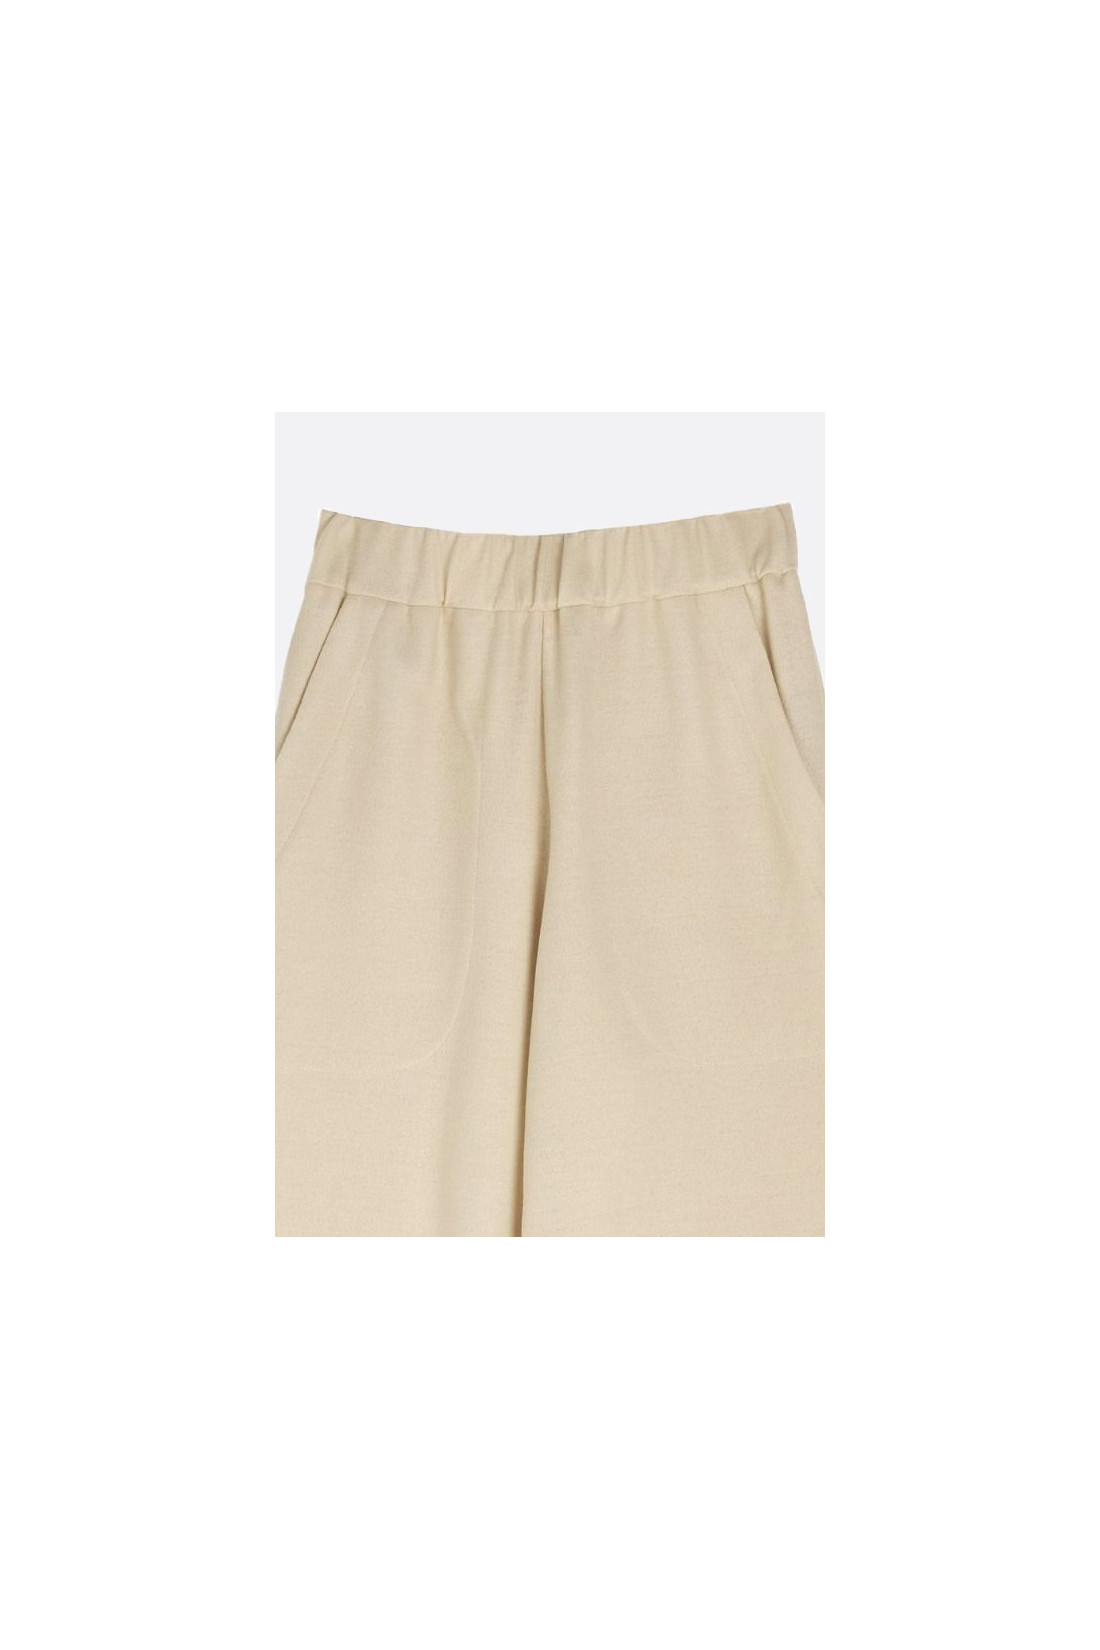 BARENA FOR WOMAN / Trousers joie Rova avorio